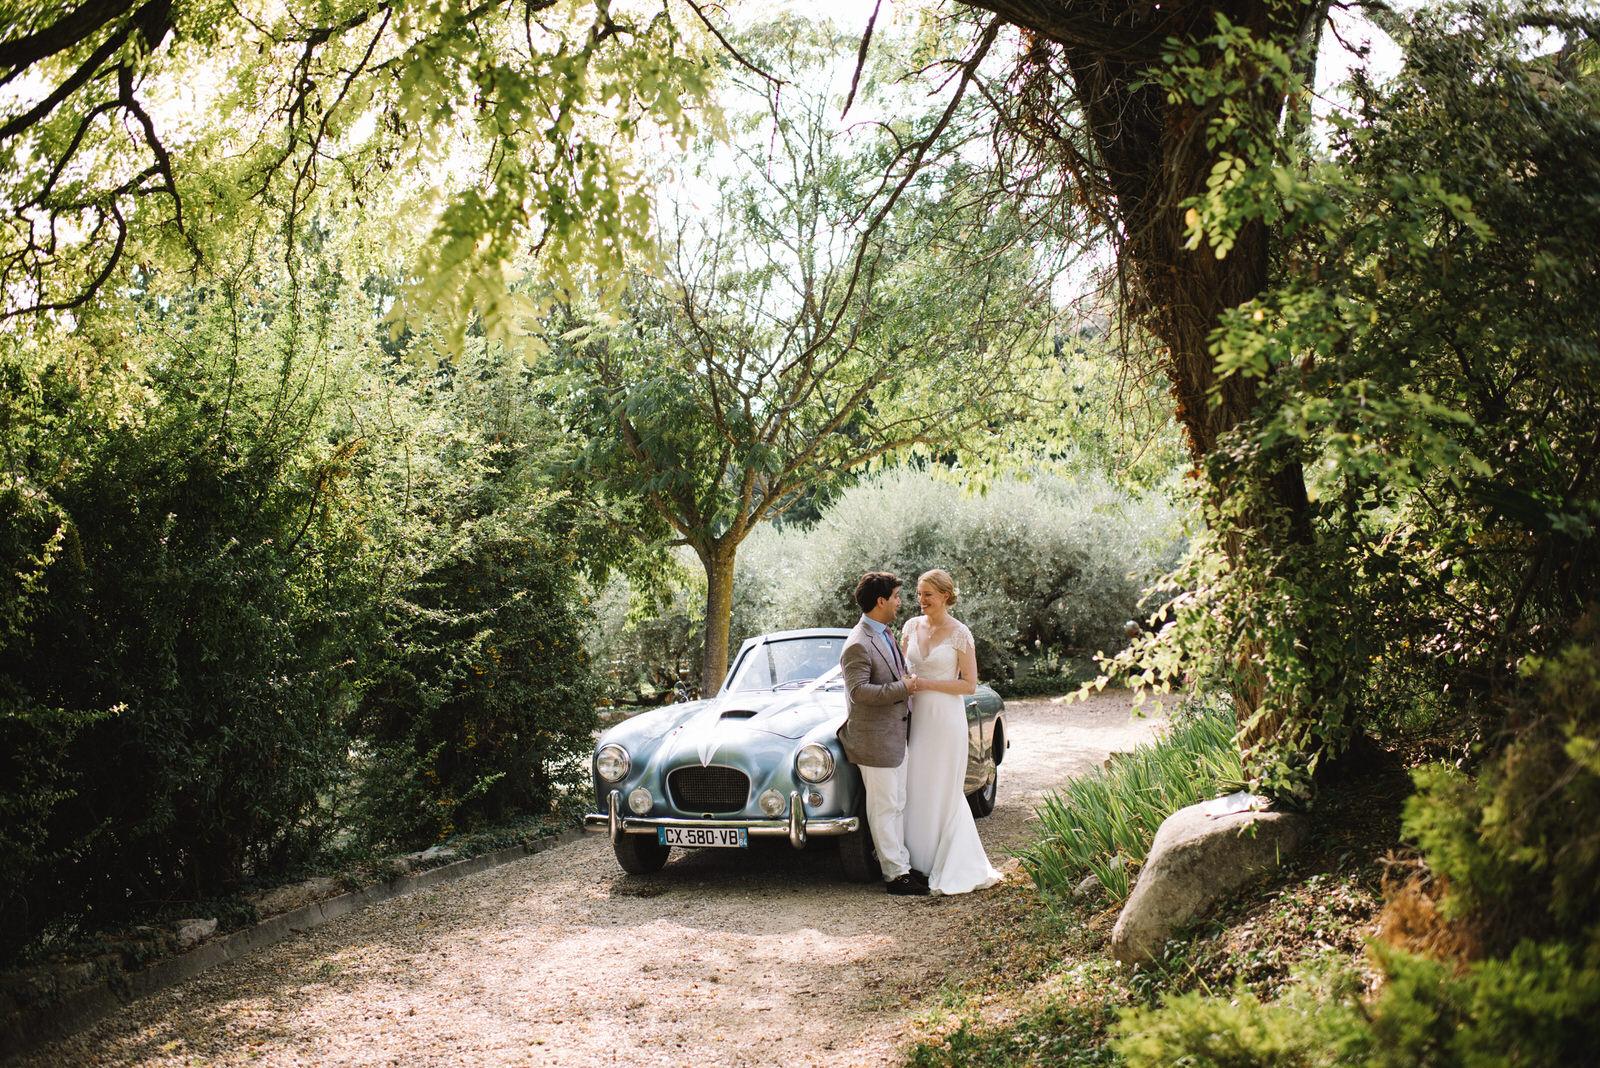 026-LOURMARIN-WEDDING-PHOTOGRAPHER-PROVENCE-WEDDING-ALTERNATIVE-WEDDING-PHOTOGRAPHY-FRANCE-PROVENCE-GARDEN-WEDDING.JPG